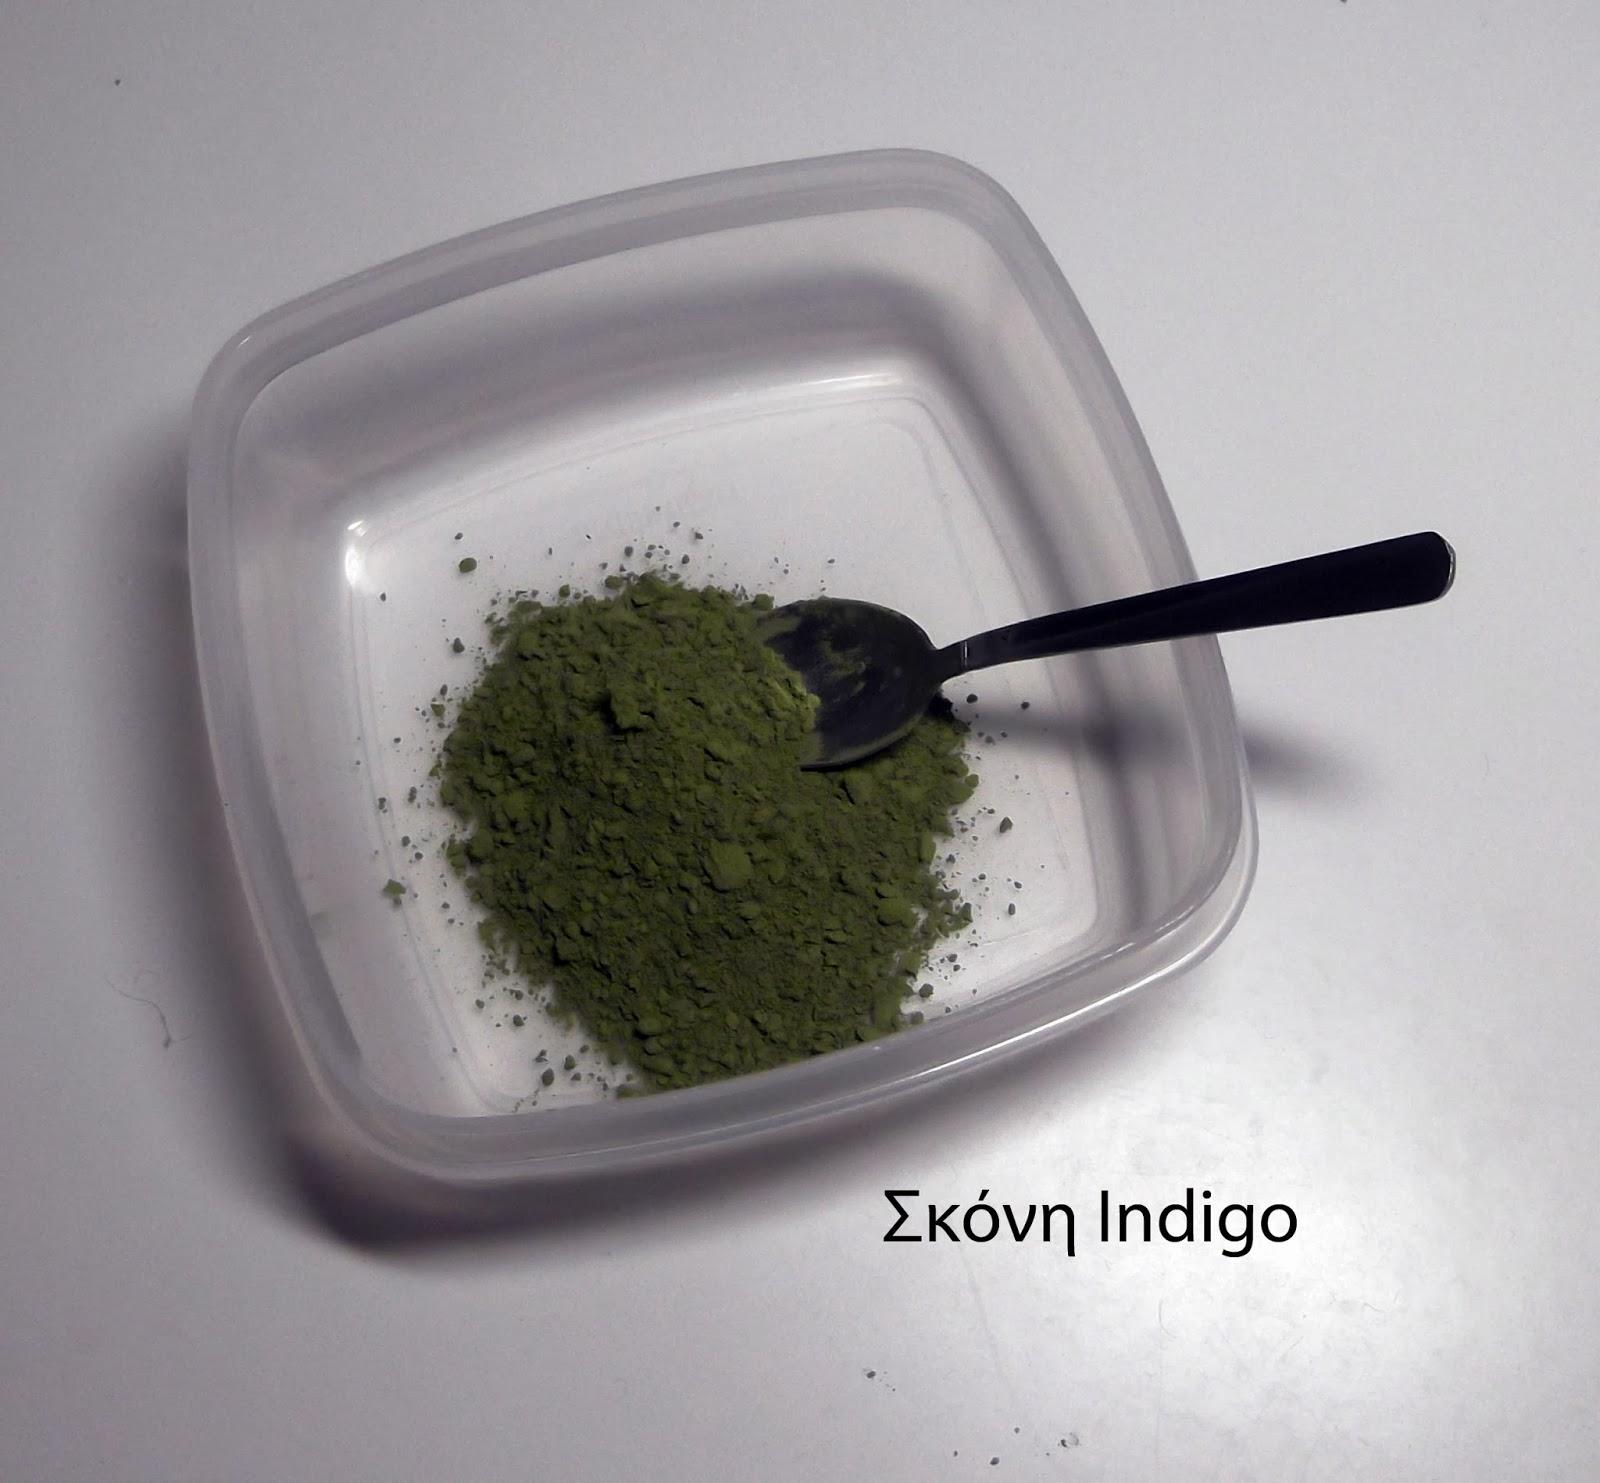 indigo, λουλάκι, σκόνη indigo